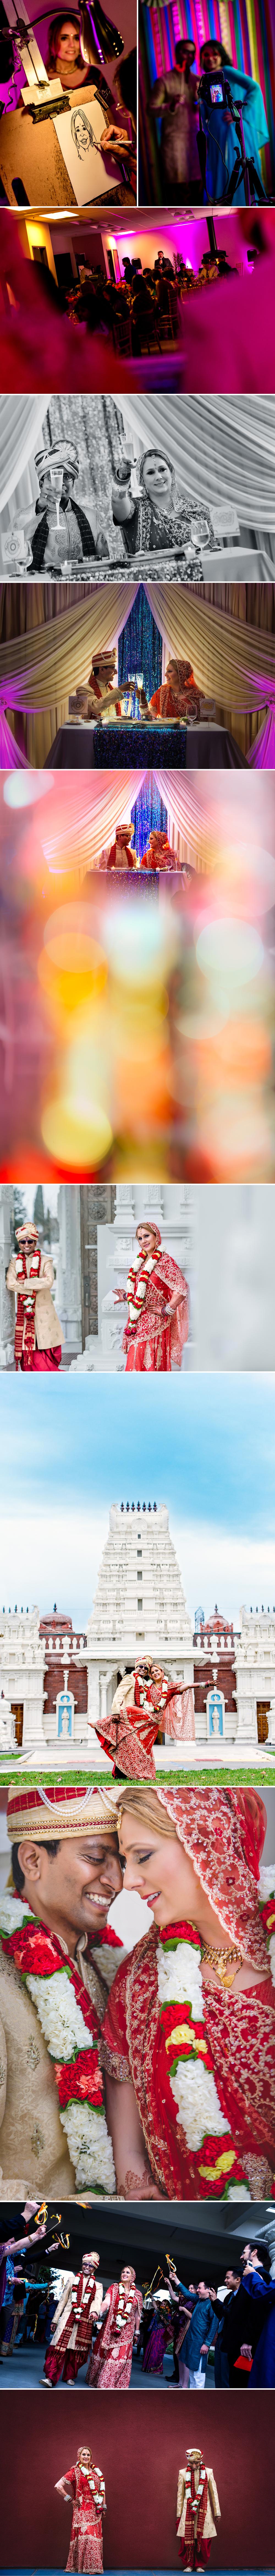 Indian Wedding Photographer Bay Area